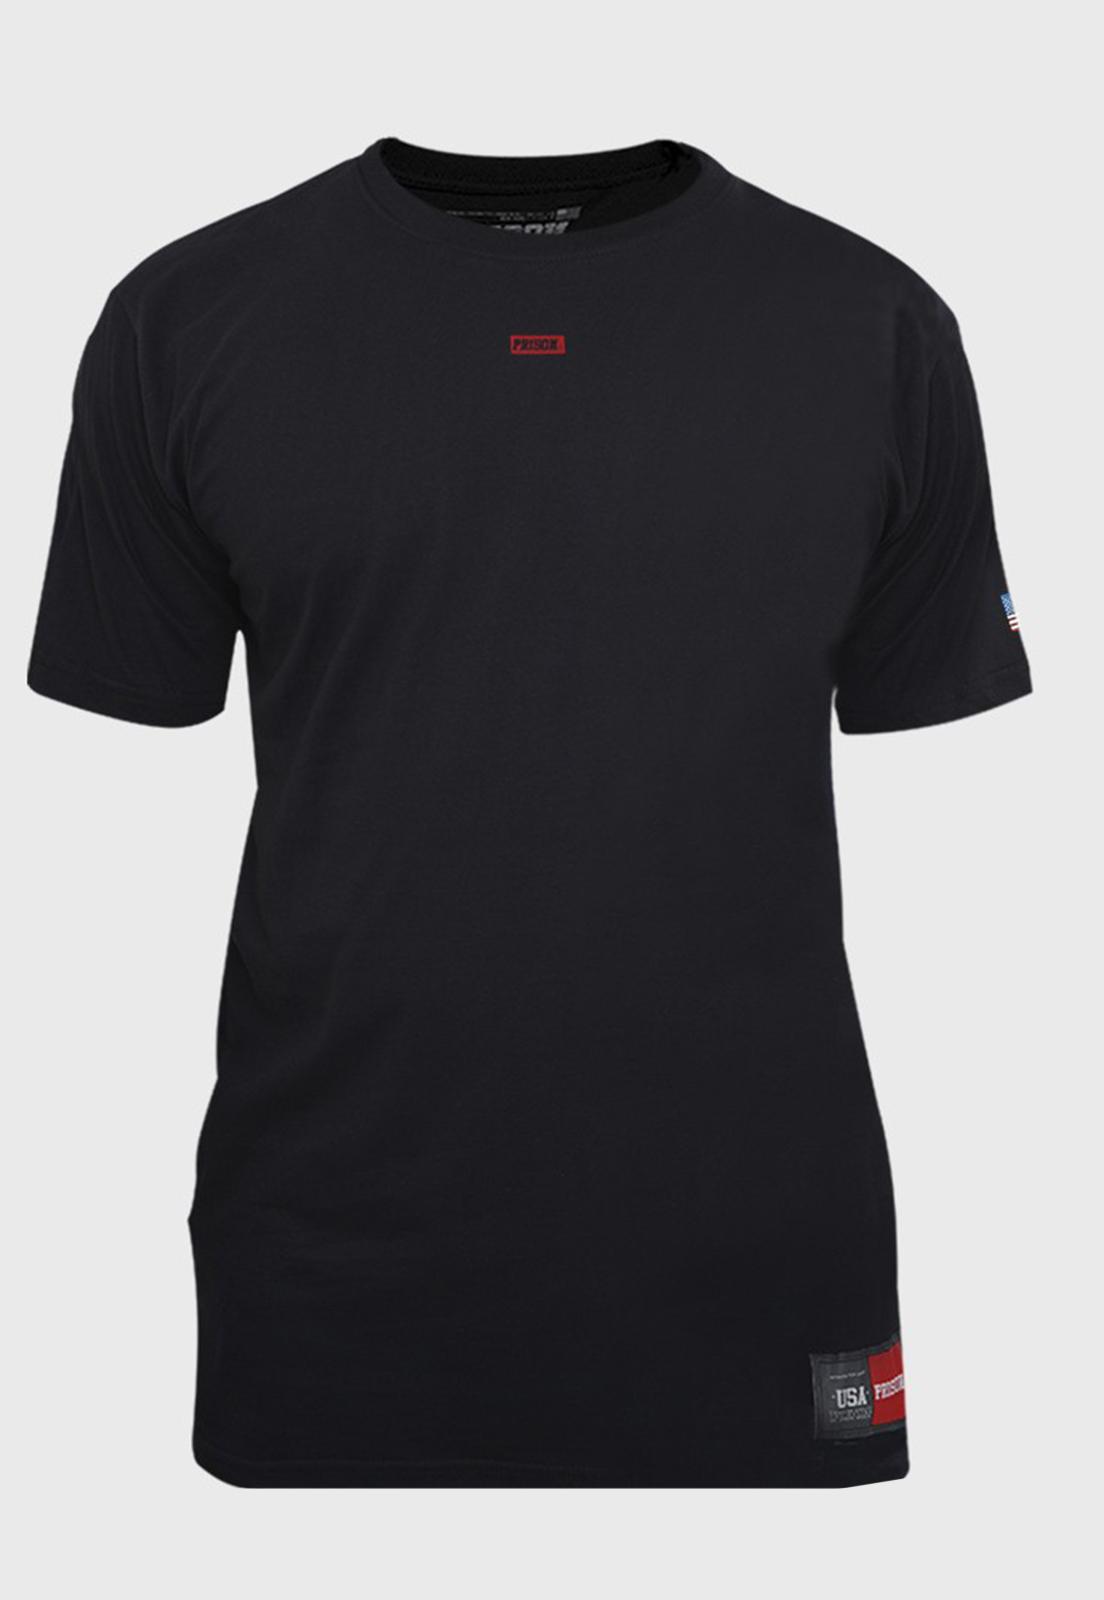 Camiseta Prison The minimalist Preto